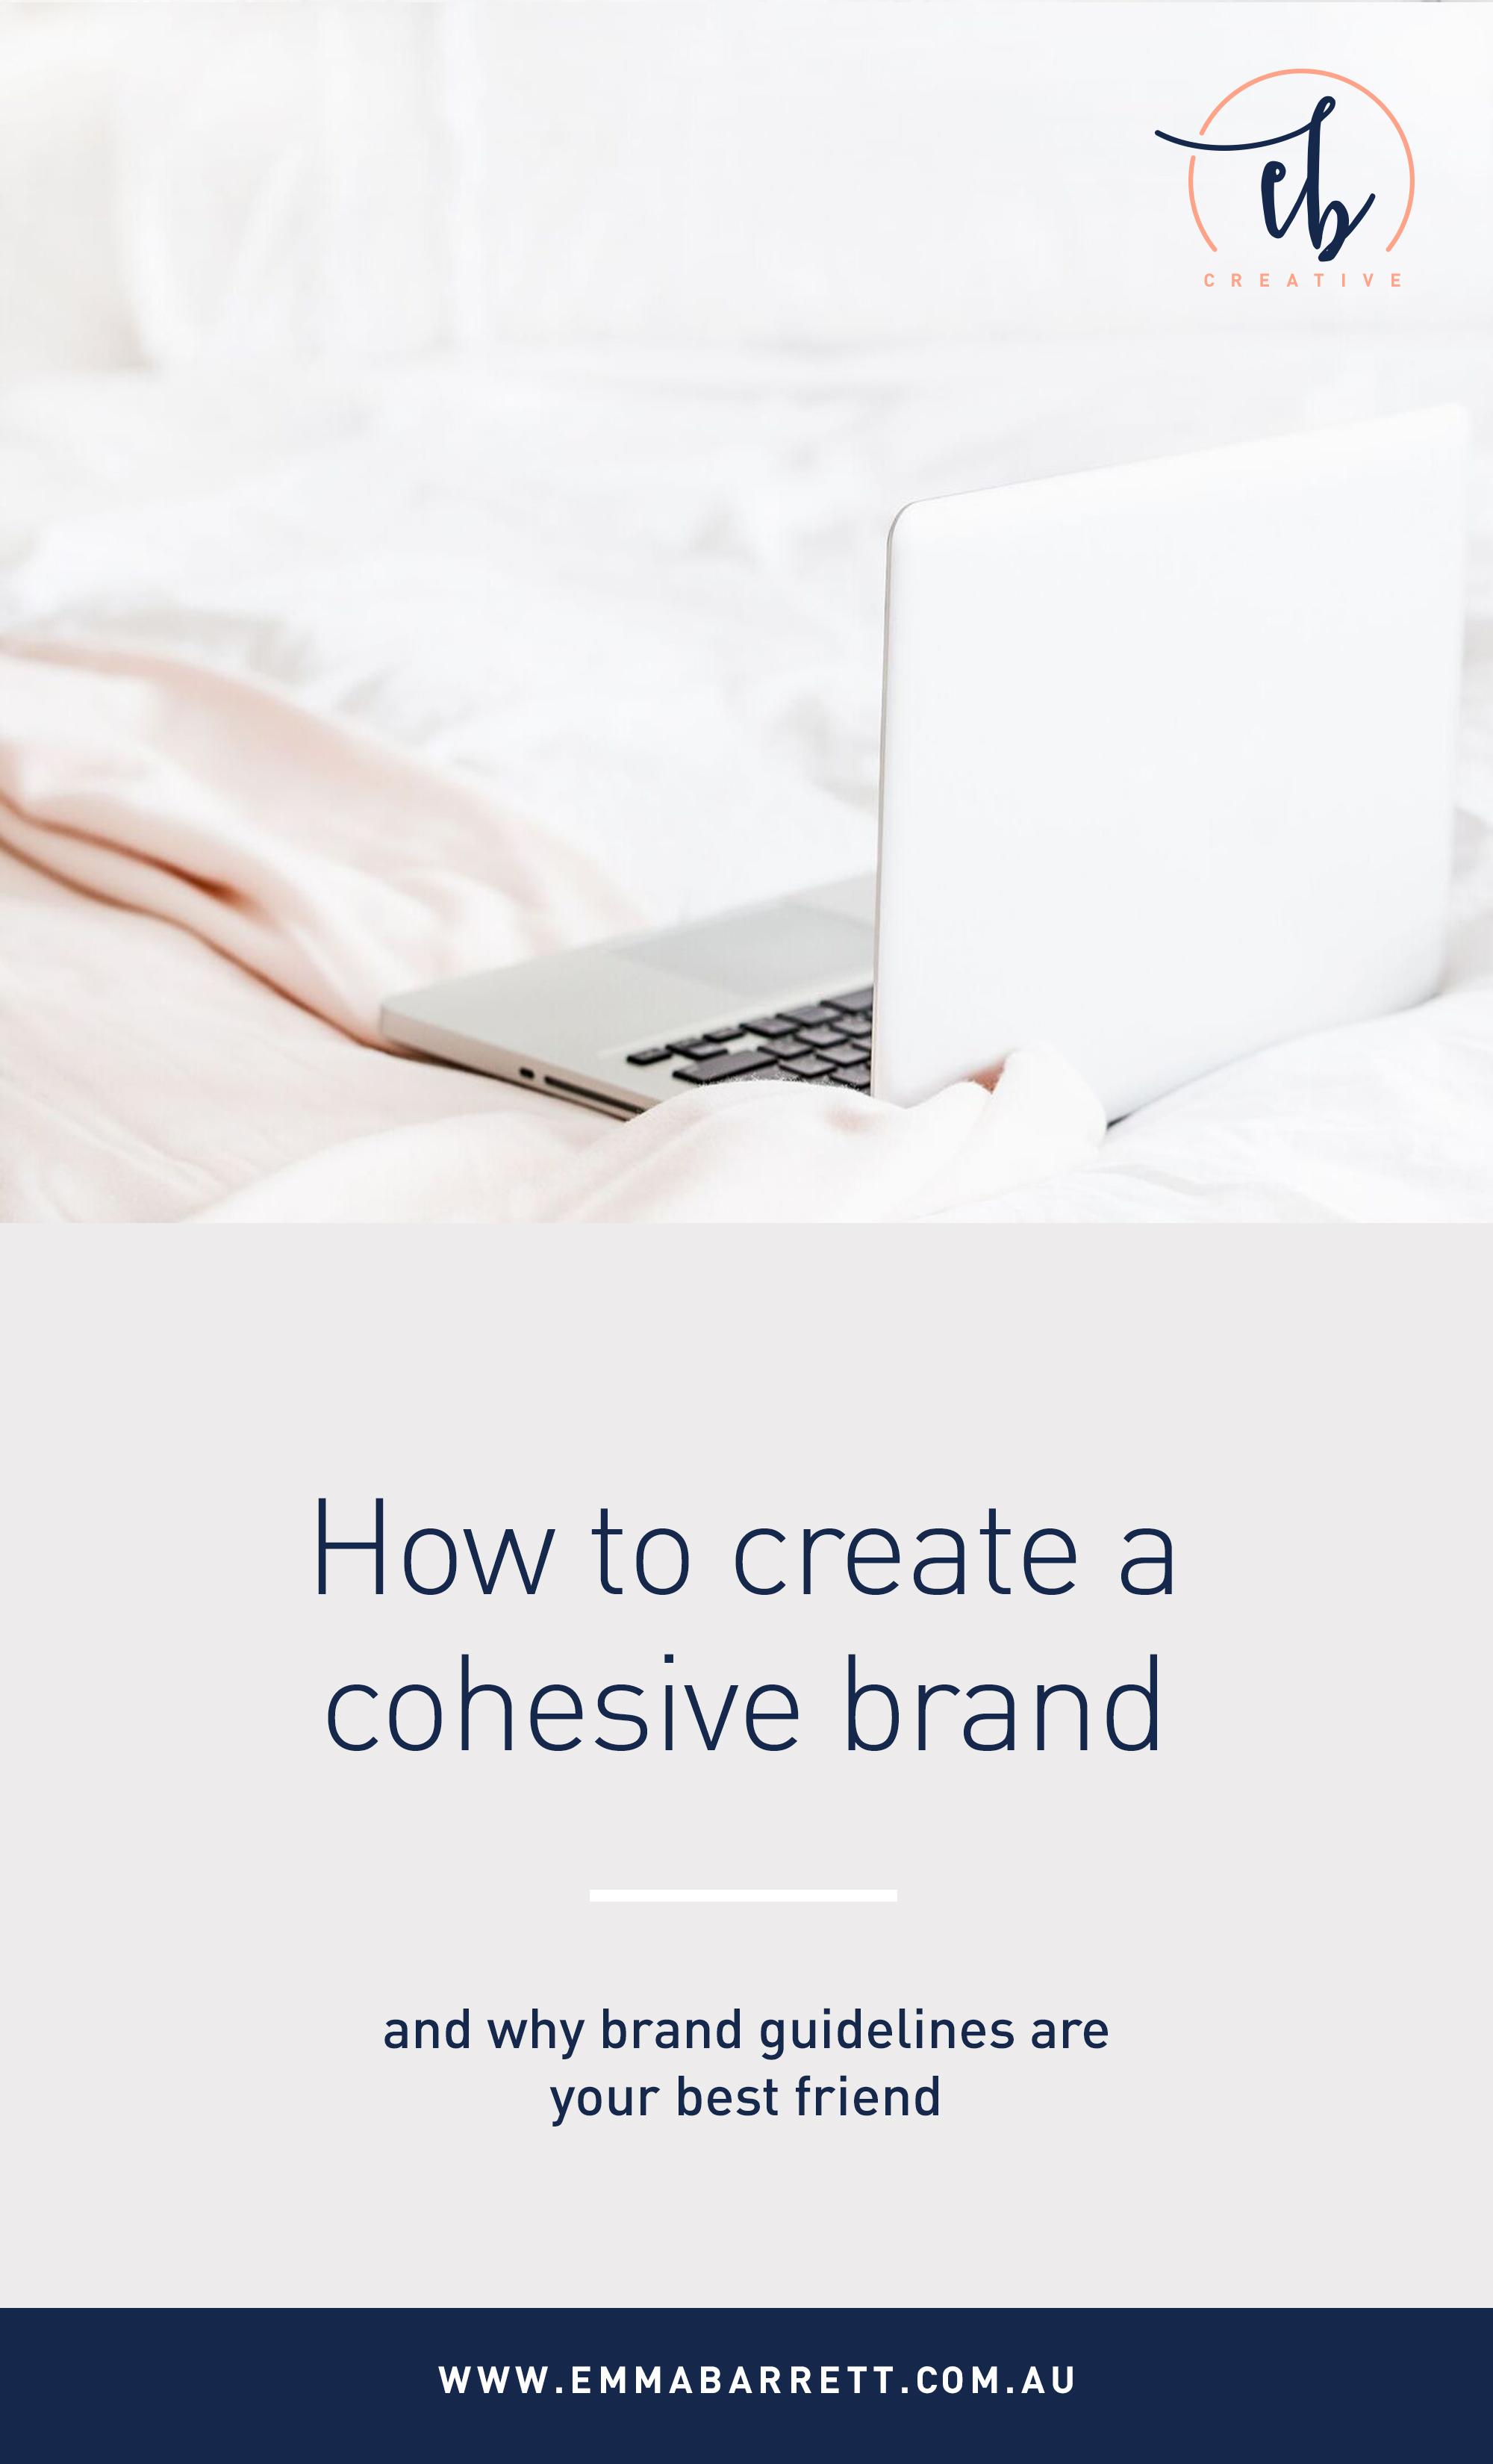 Blog_how_to_Create_a_cohesive_brand_emmabarrettcreative.jpg